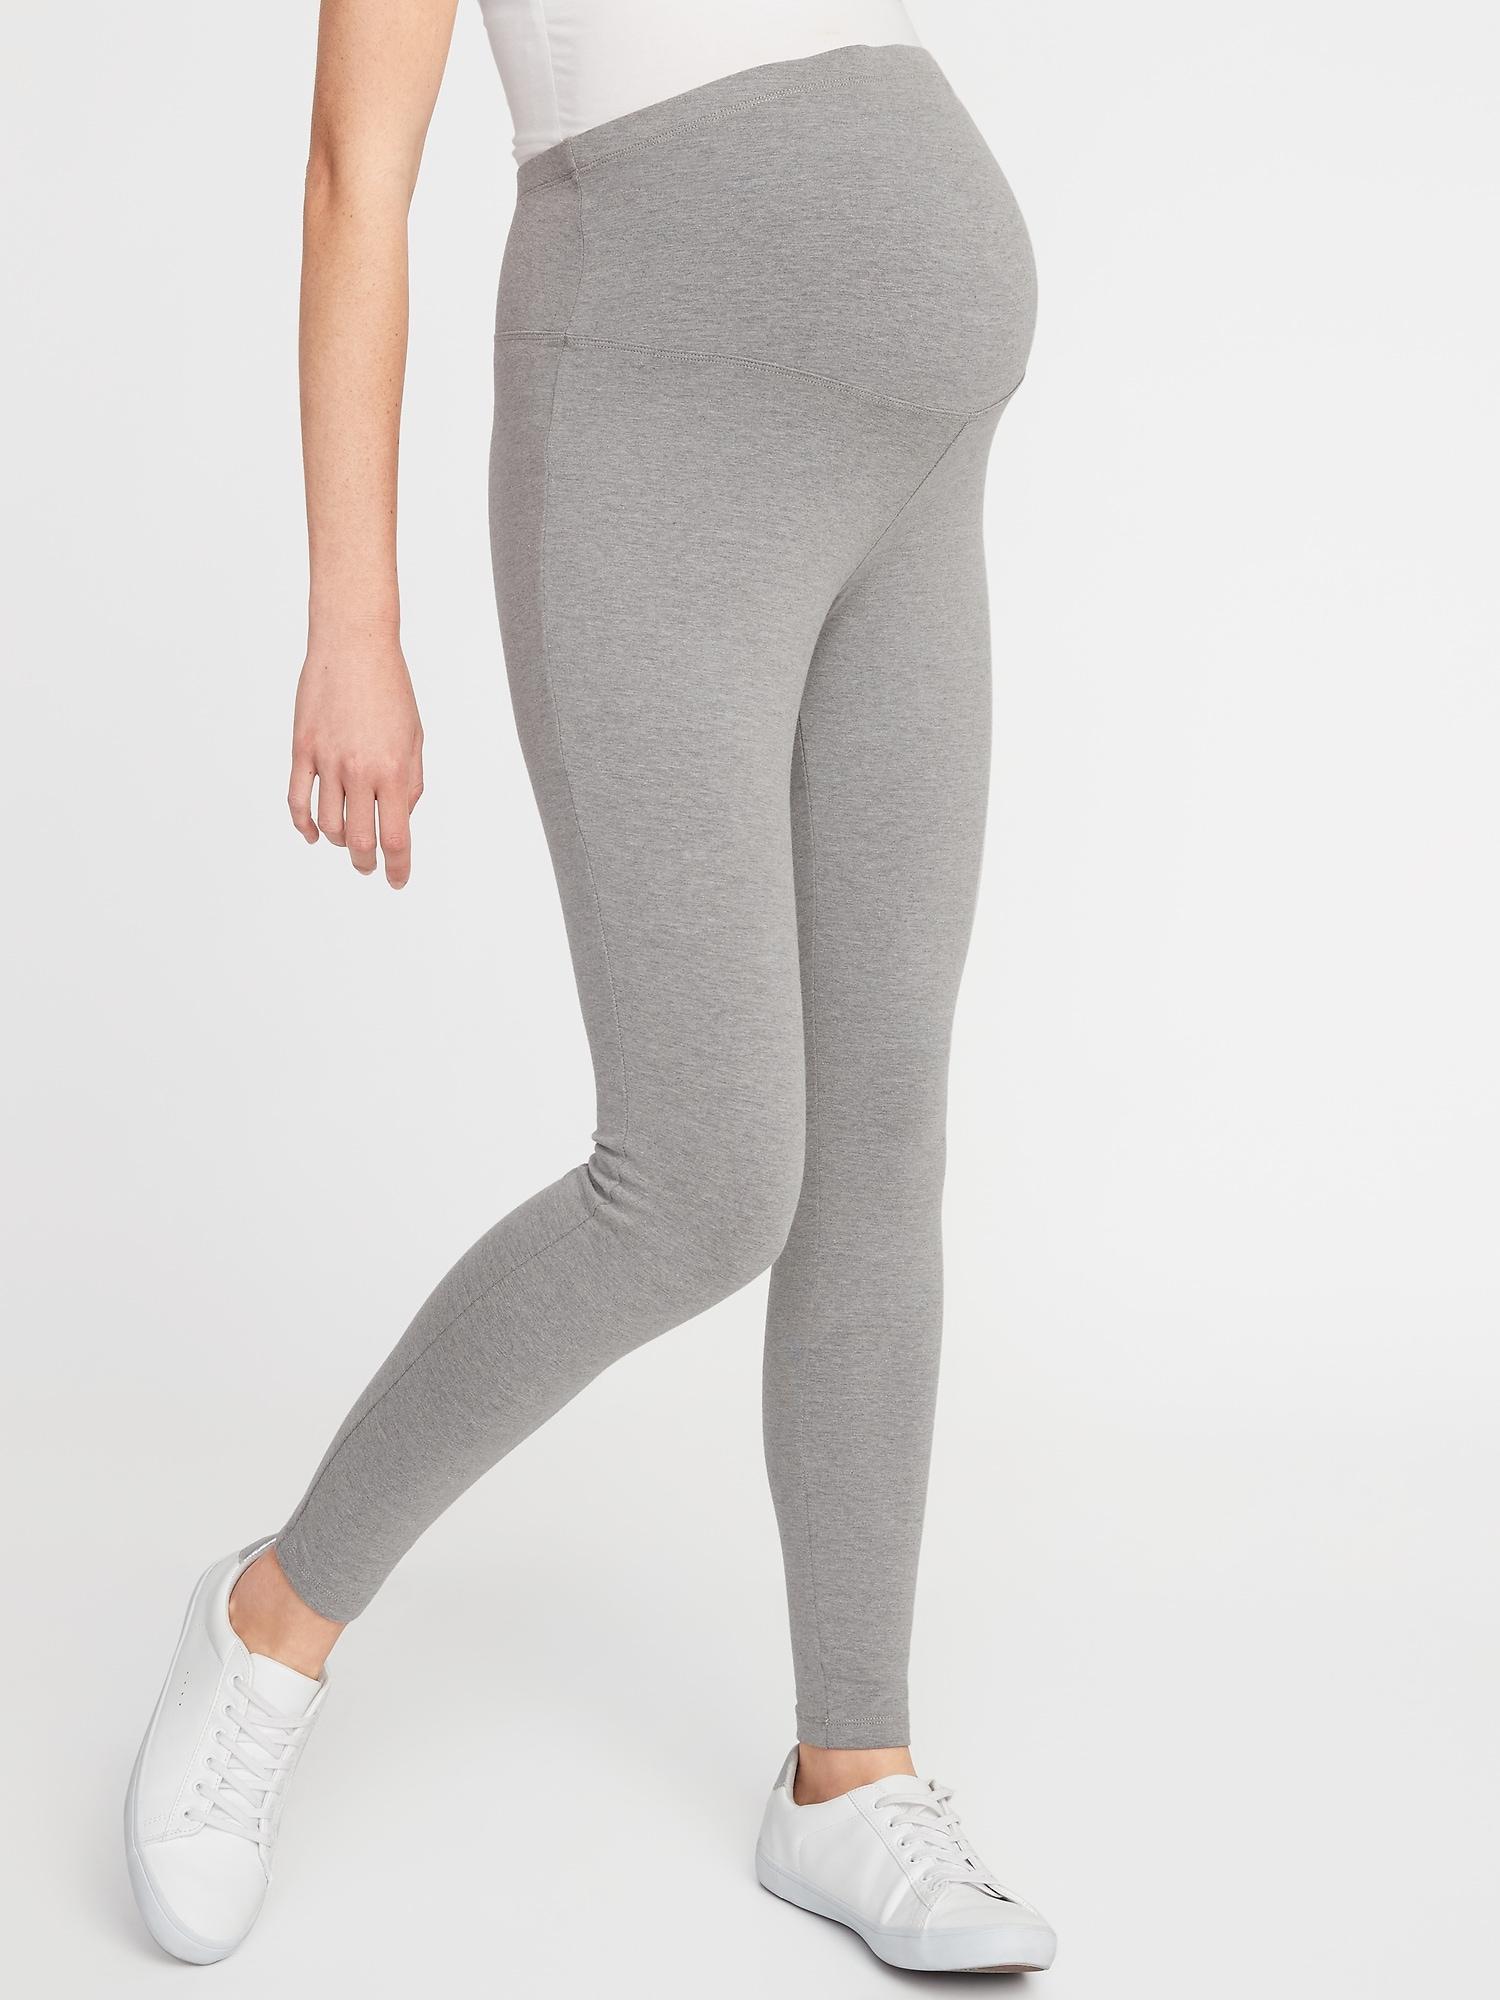 4372bfe5947ed Lyst - Old Navy Maternity Full-panel Jersey Leggings in Gray